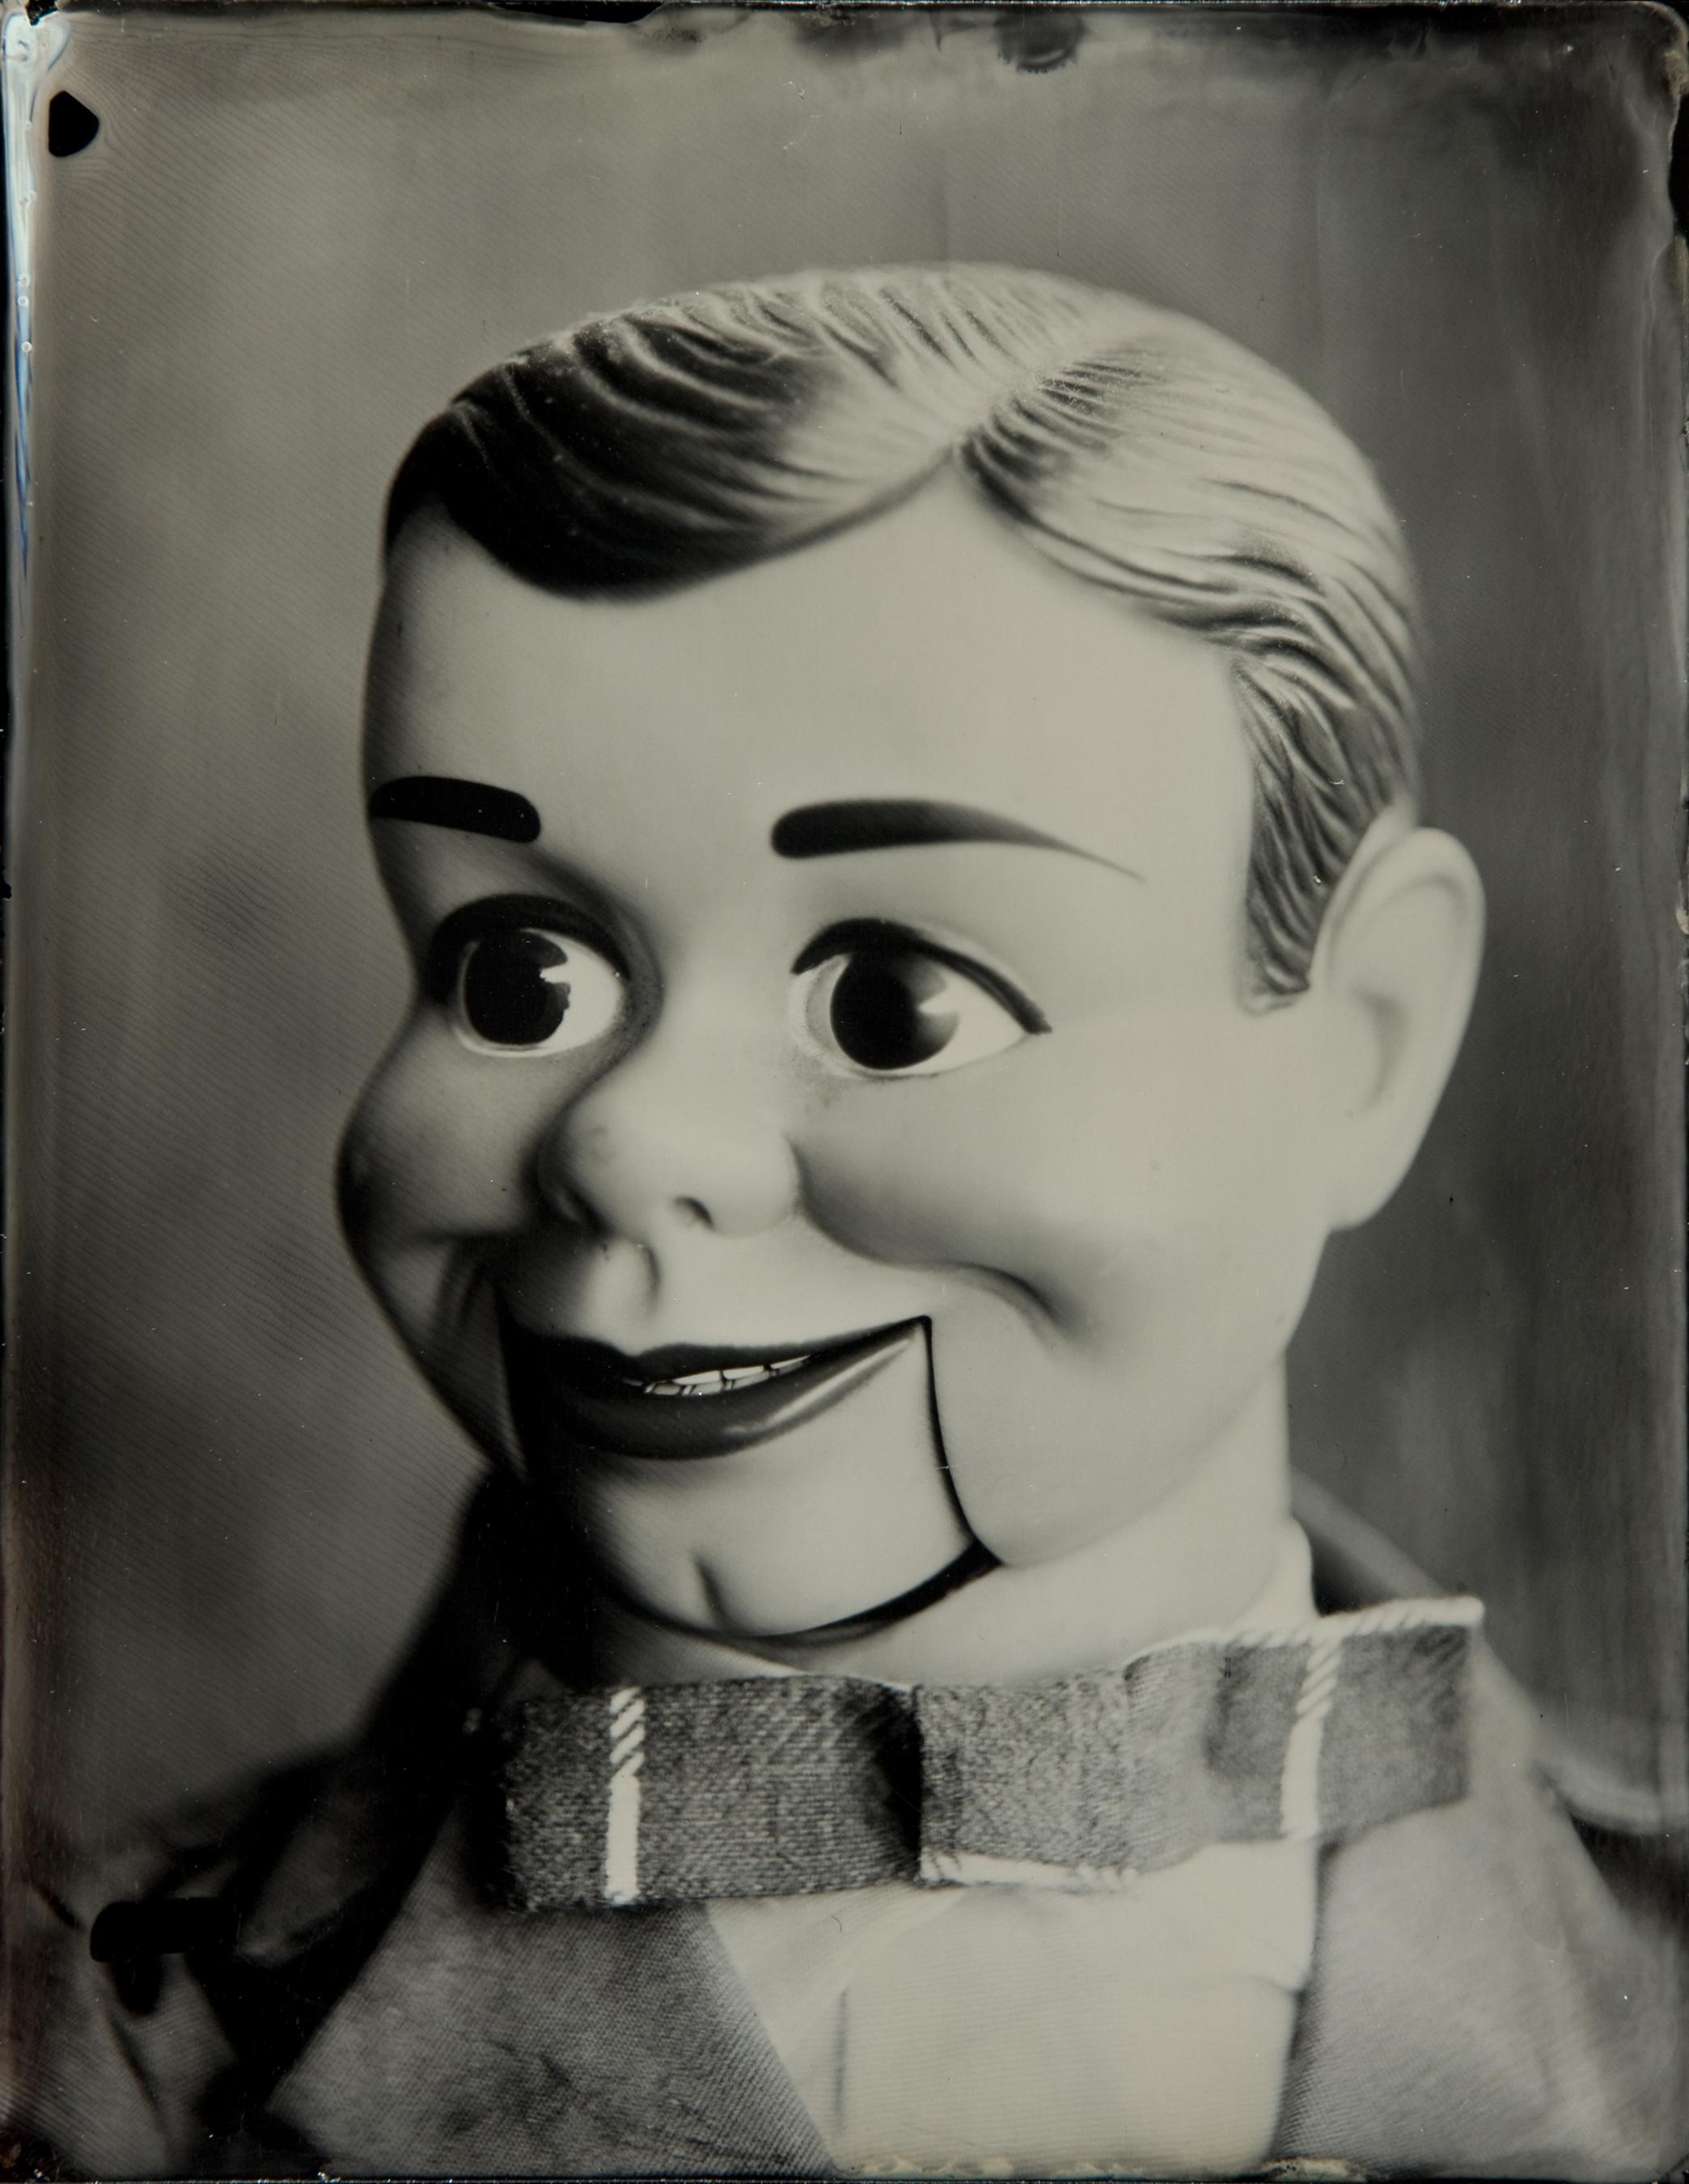 Chuckie.jpg